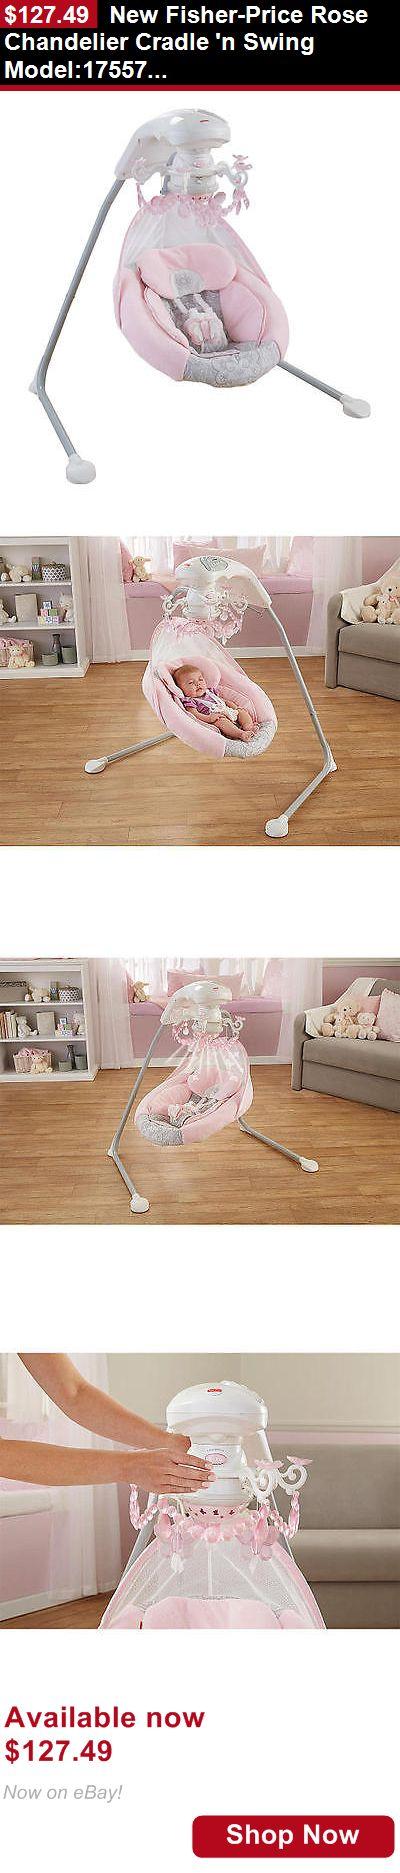 Baby swings: New Fisher-Price Rose Chandelier Cradle N Swing Model:17557628 BUY IT NOW ONLY: $127.49